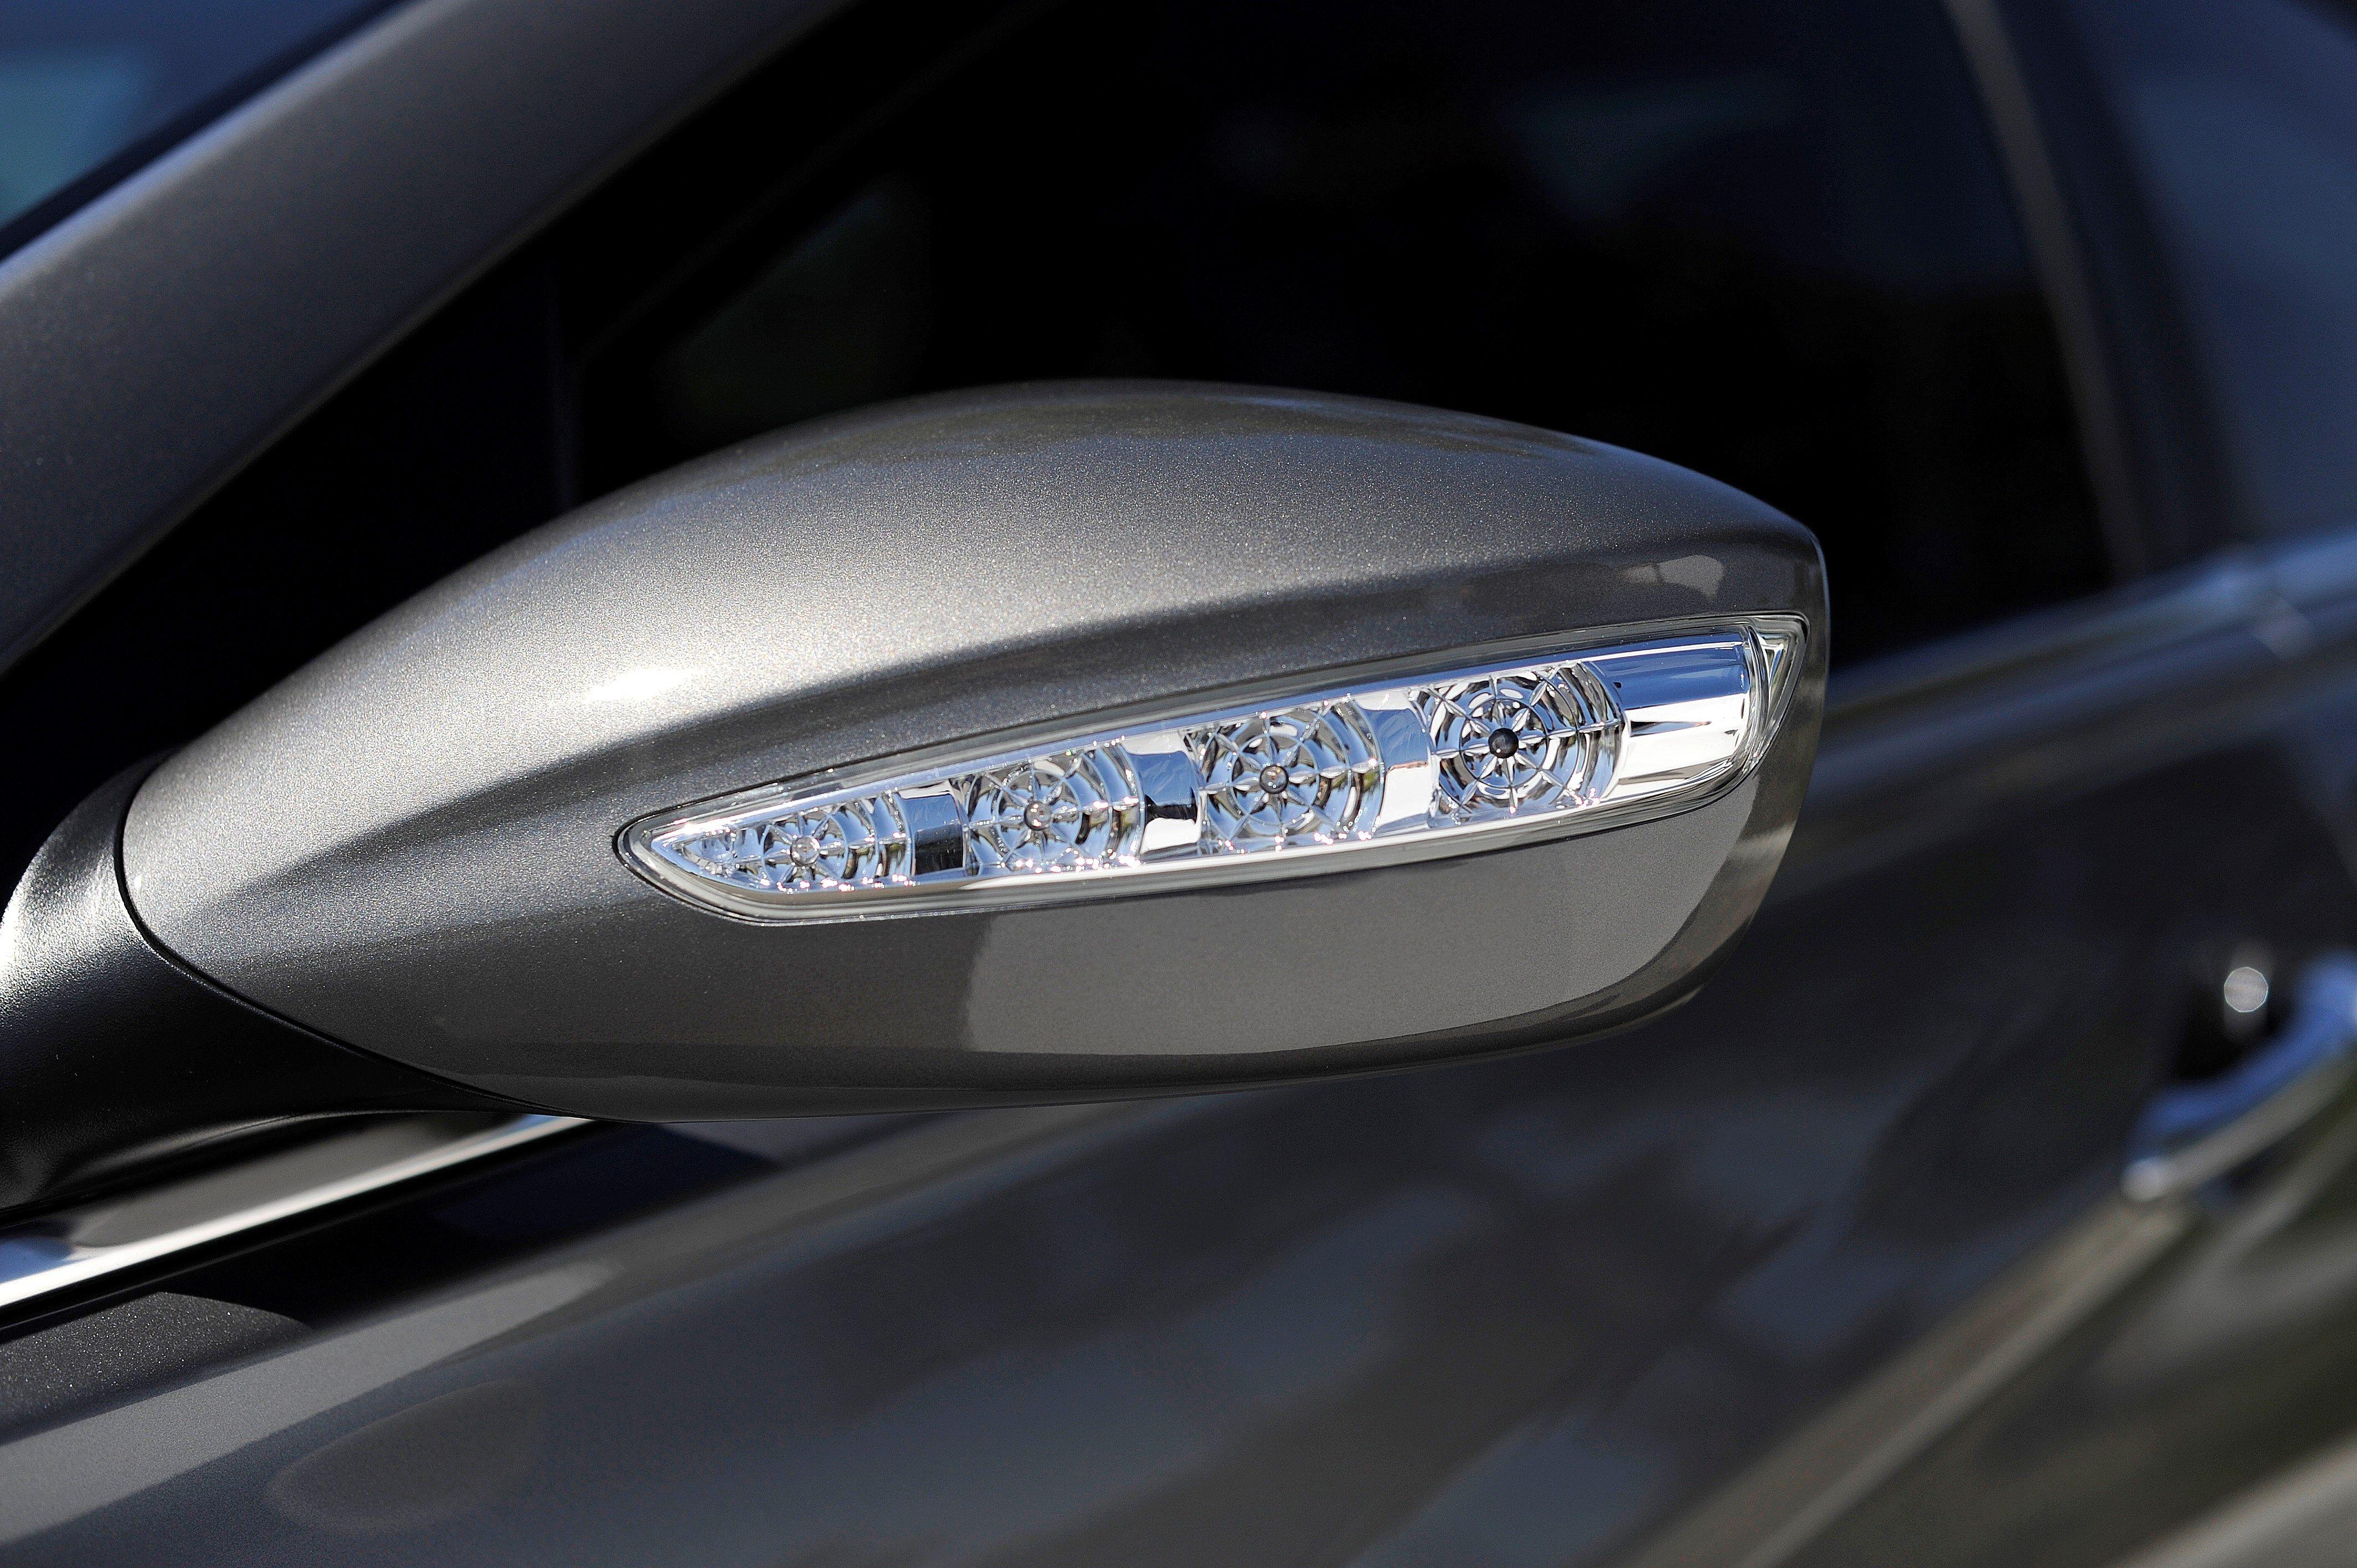 2014 Hyundai Sonata Mirror LED Turn Signal Indicators